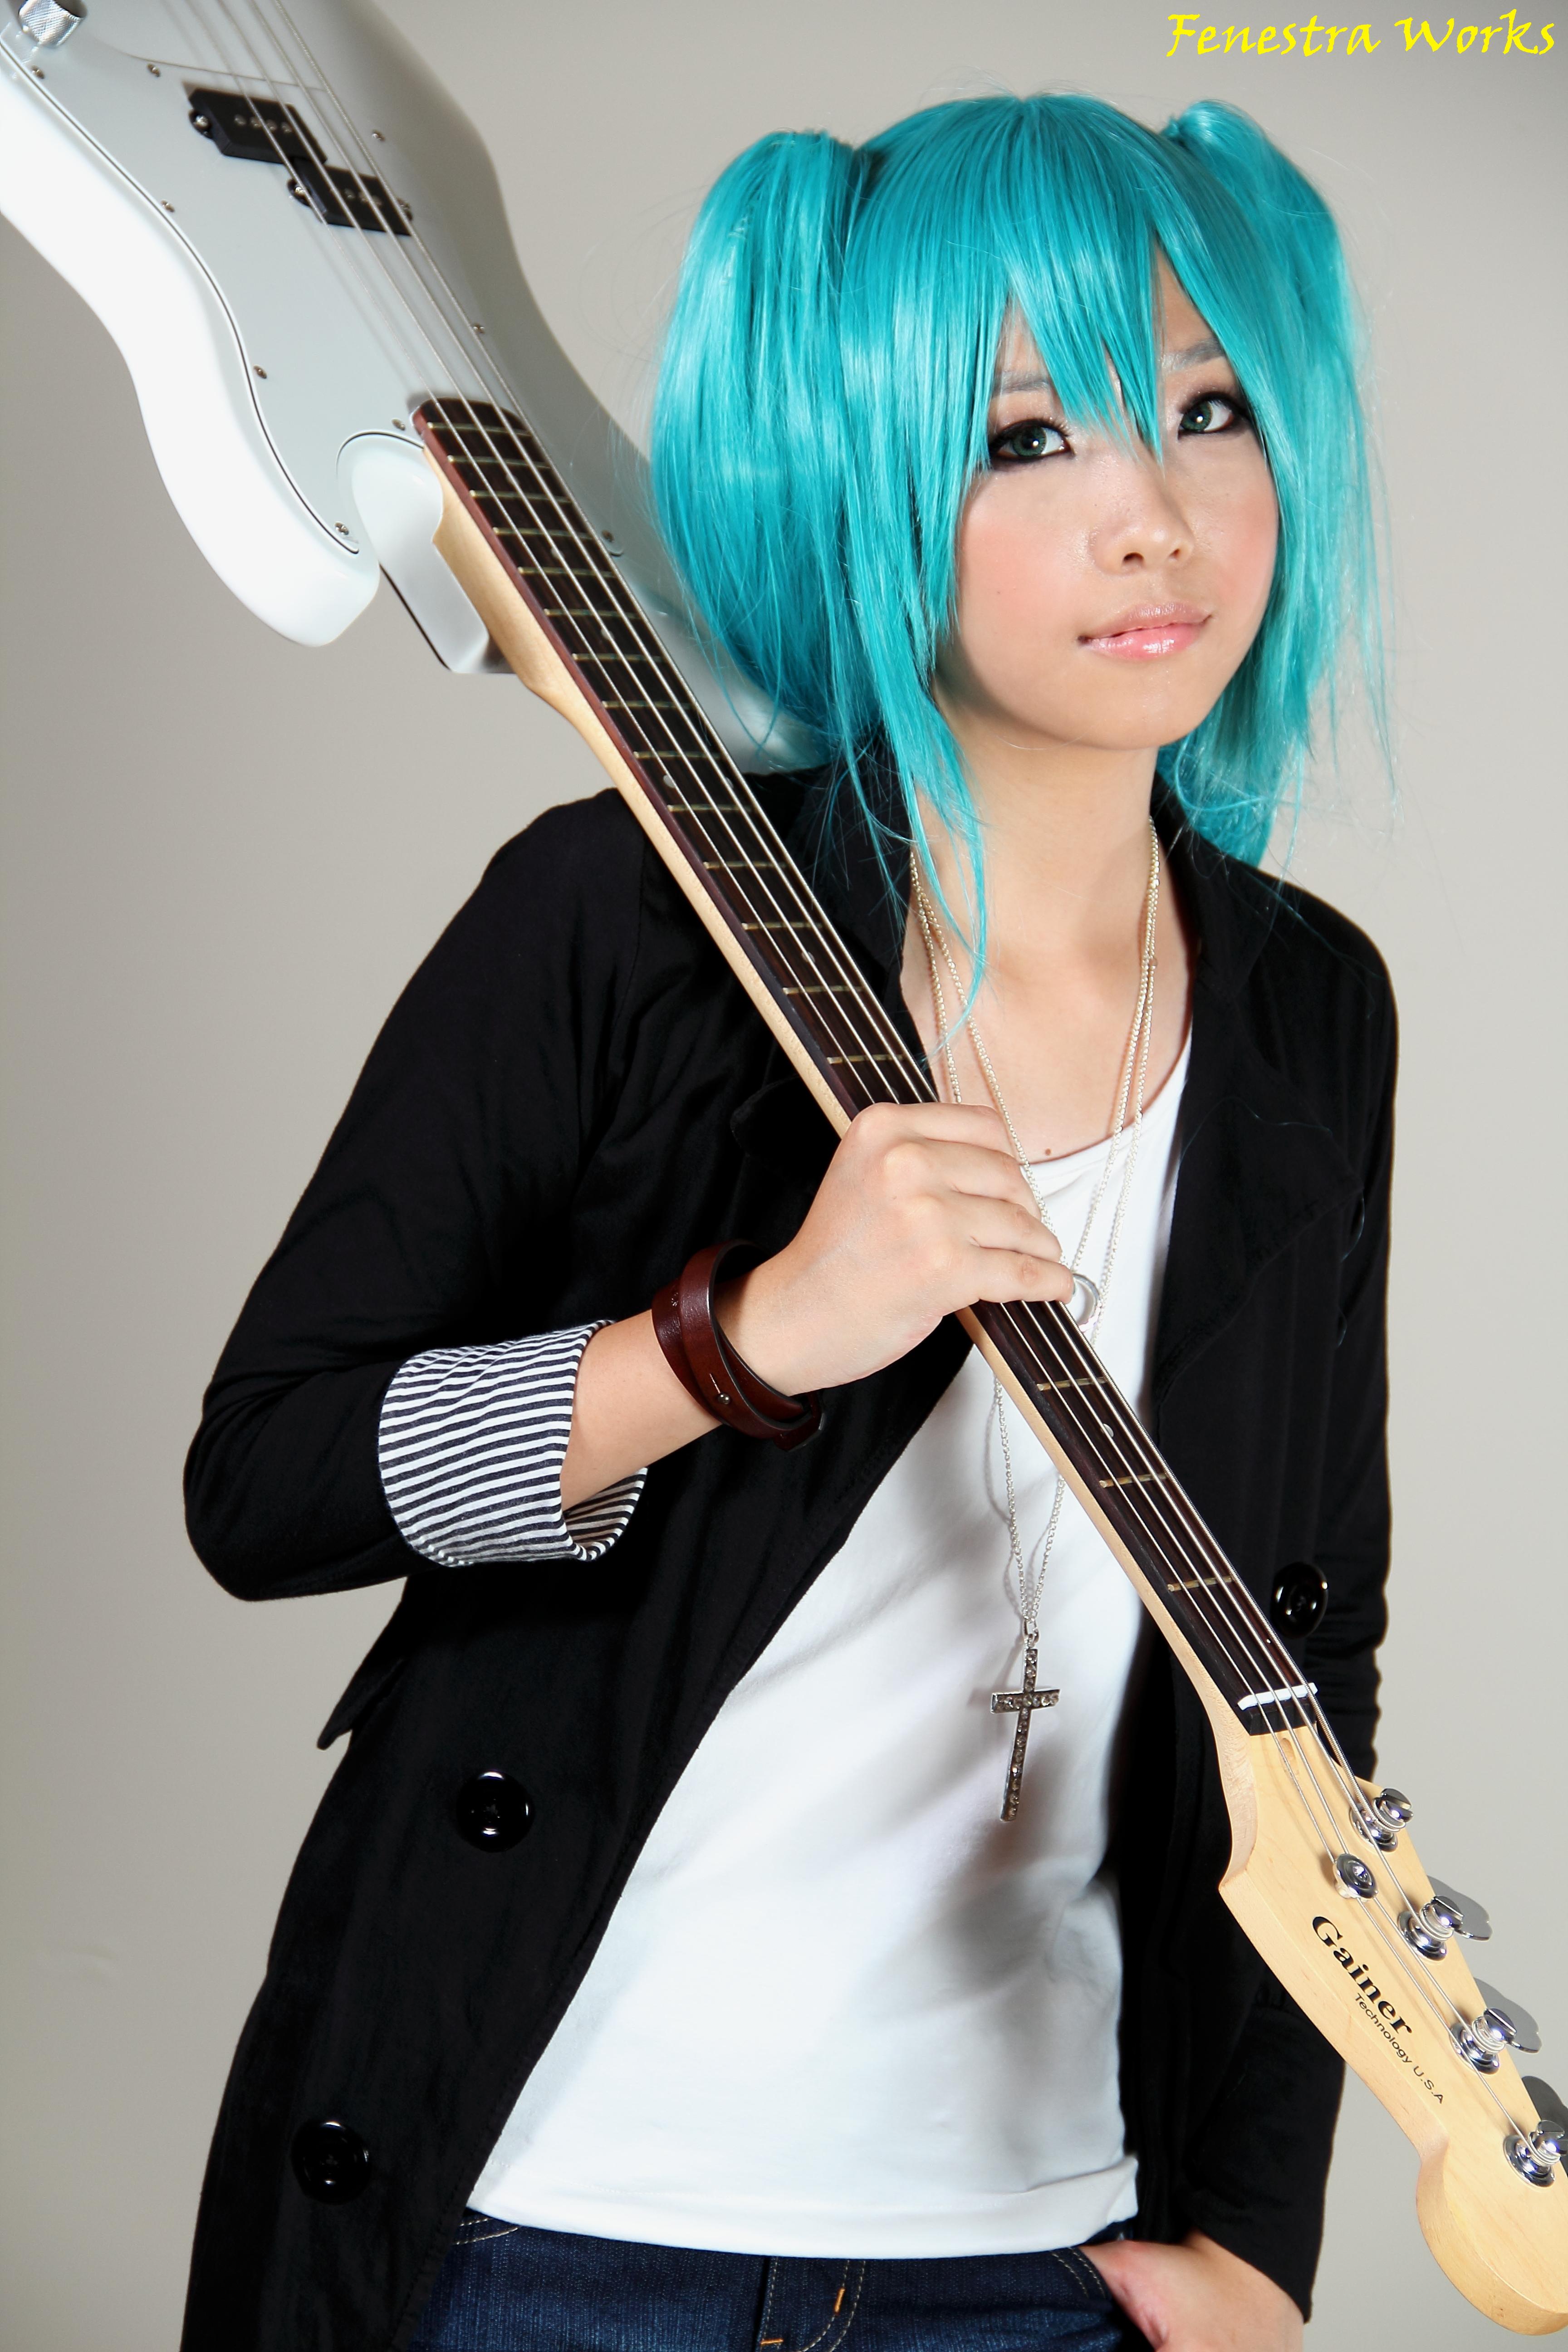 Miku Rock Star IV by Fenestra-Works